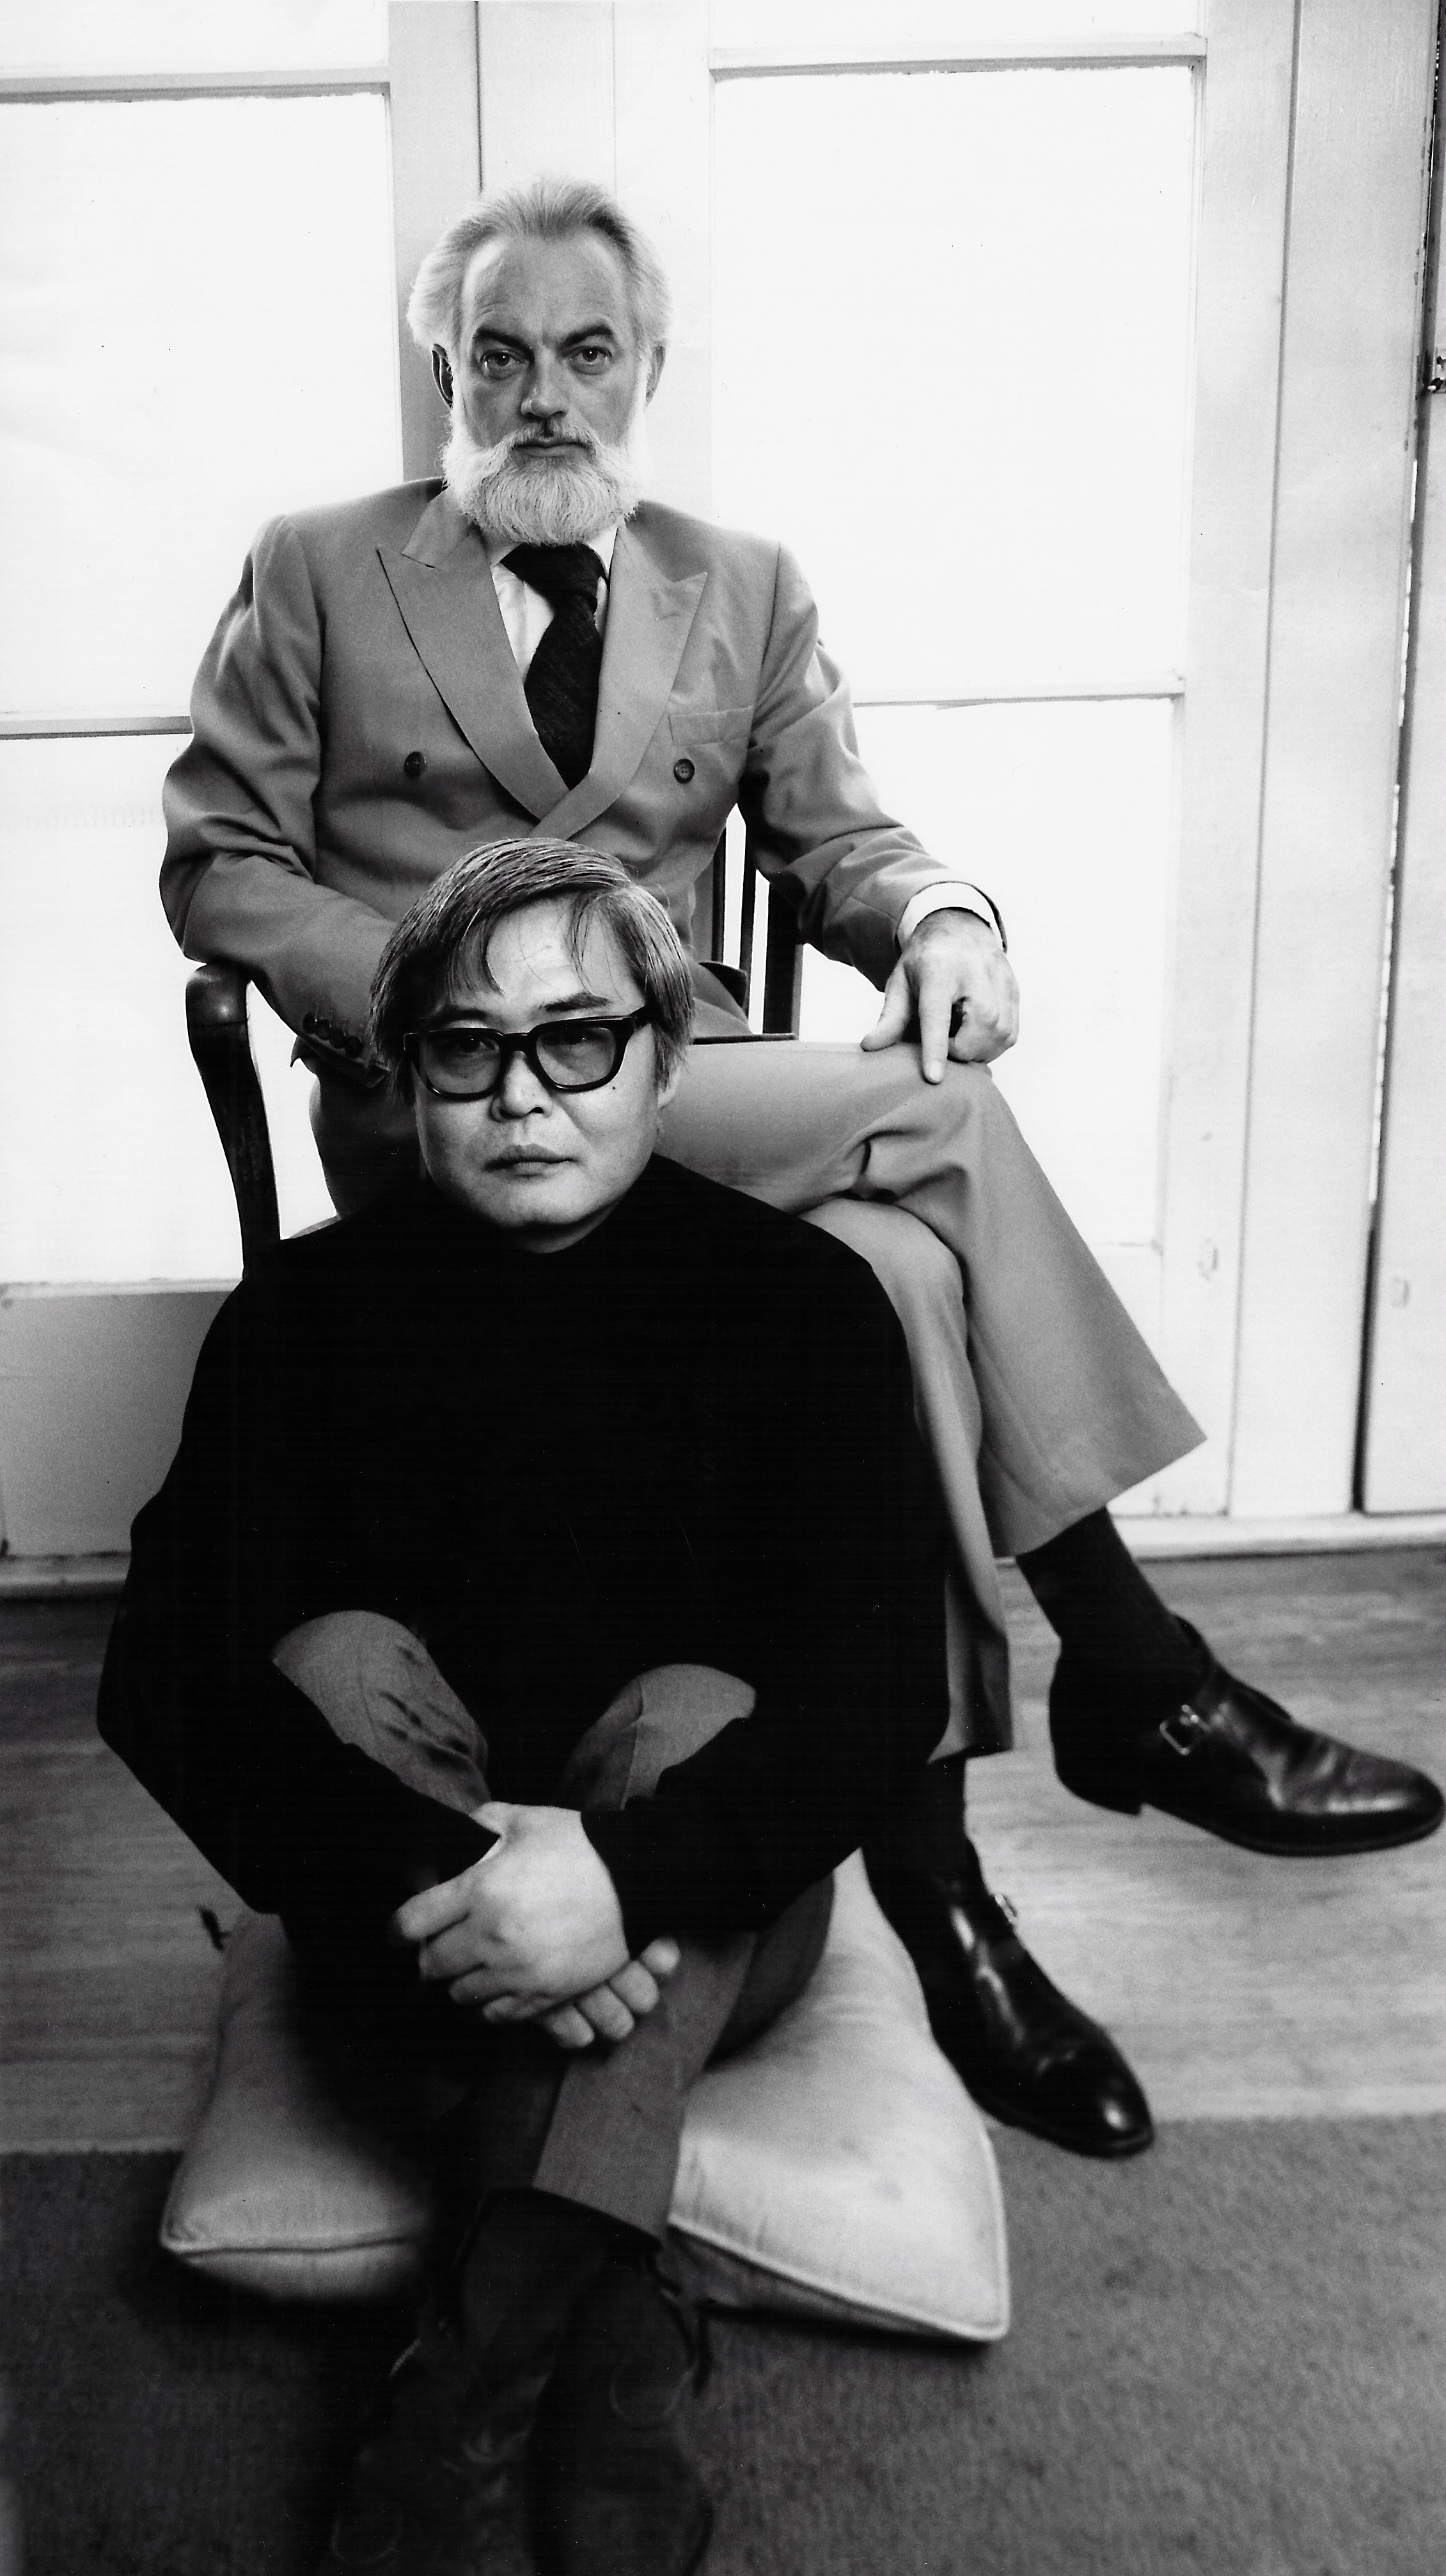 Kanemitsu and Jenkins. Photographed by Shigeo Ikeda.